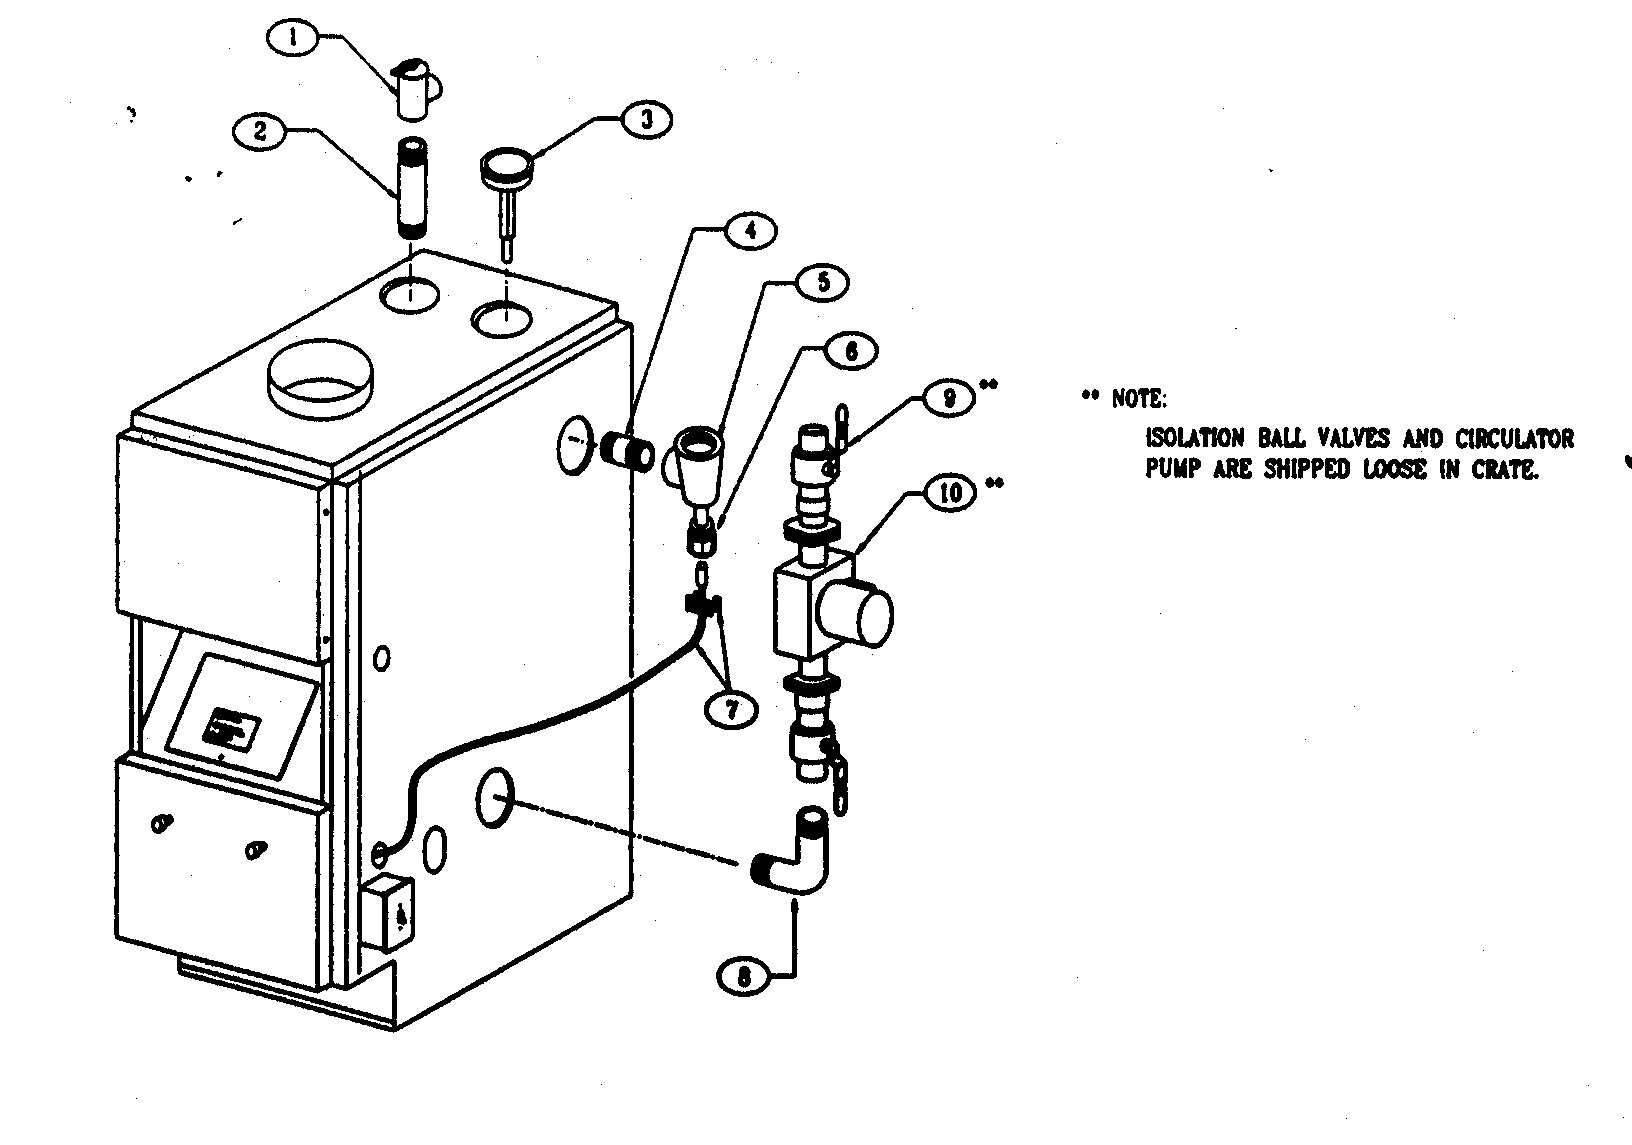 hight resolution of craftsman gt5000 deck wiring diagram